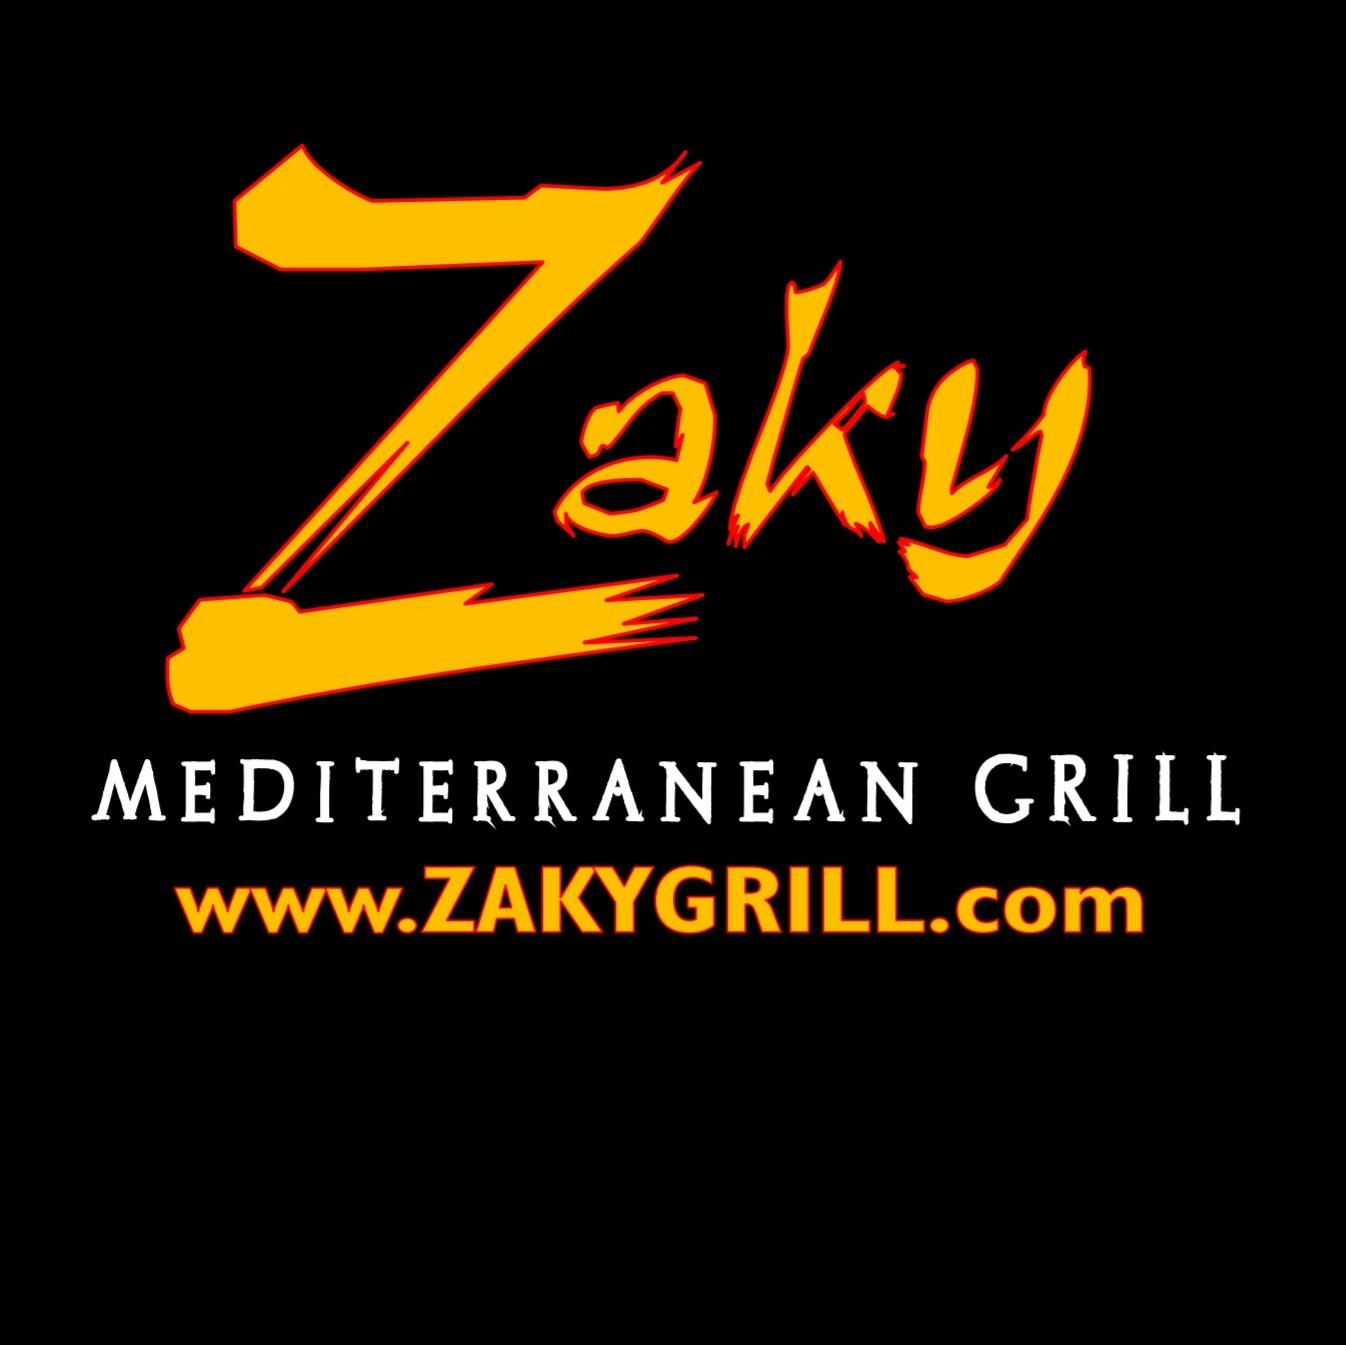 Zaky Mediterranean Grill Oc Restaurant Guides